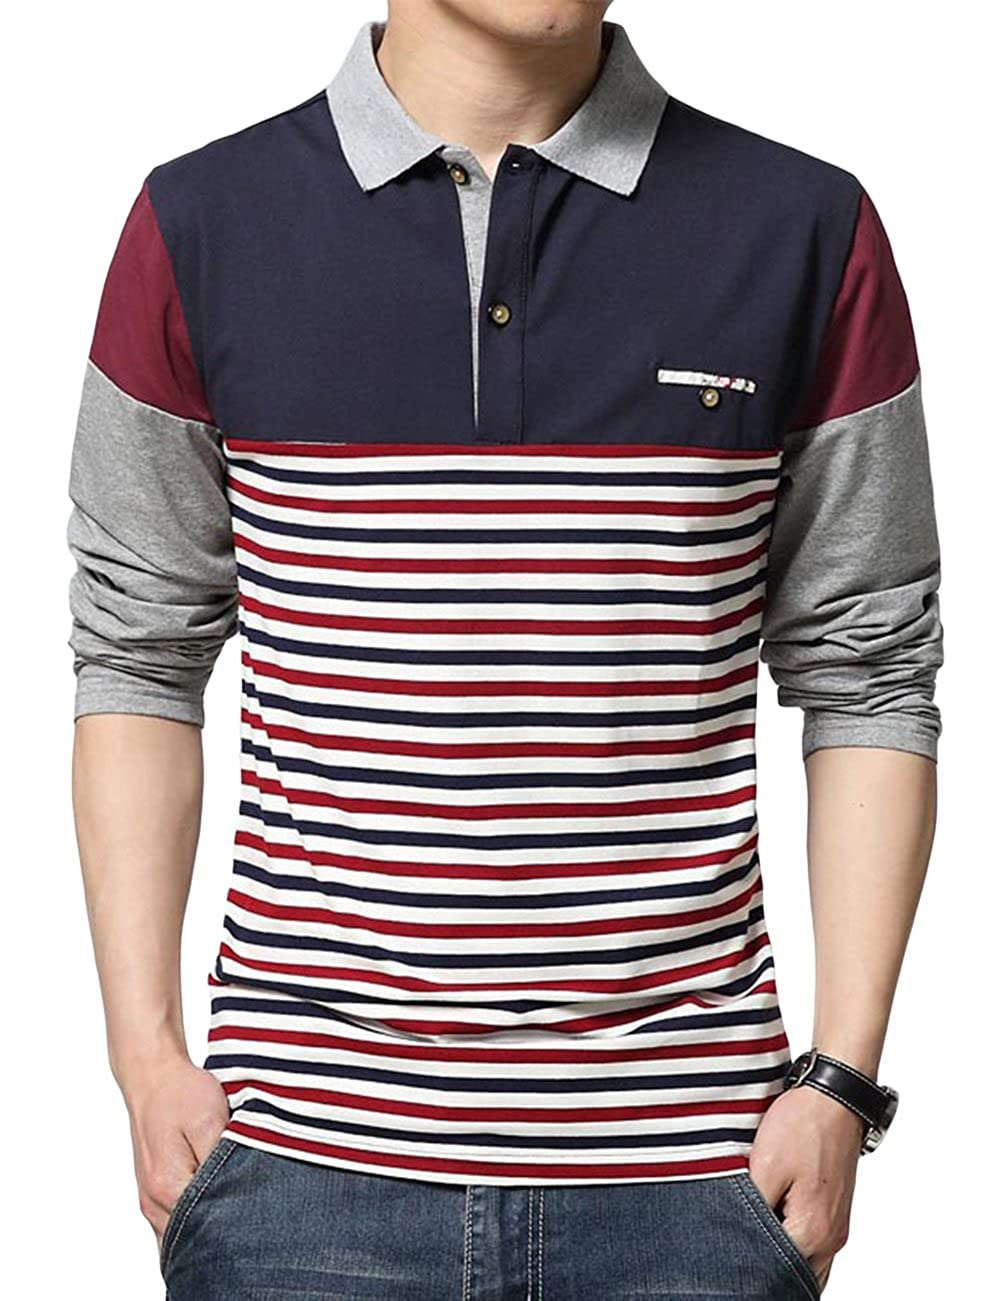 Sandbank Mens Polo Shirt Striped Contrast Color Long Sleeve Cotton T Shirt Top